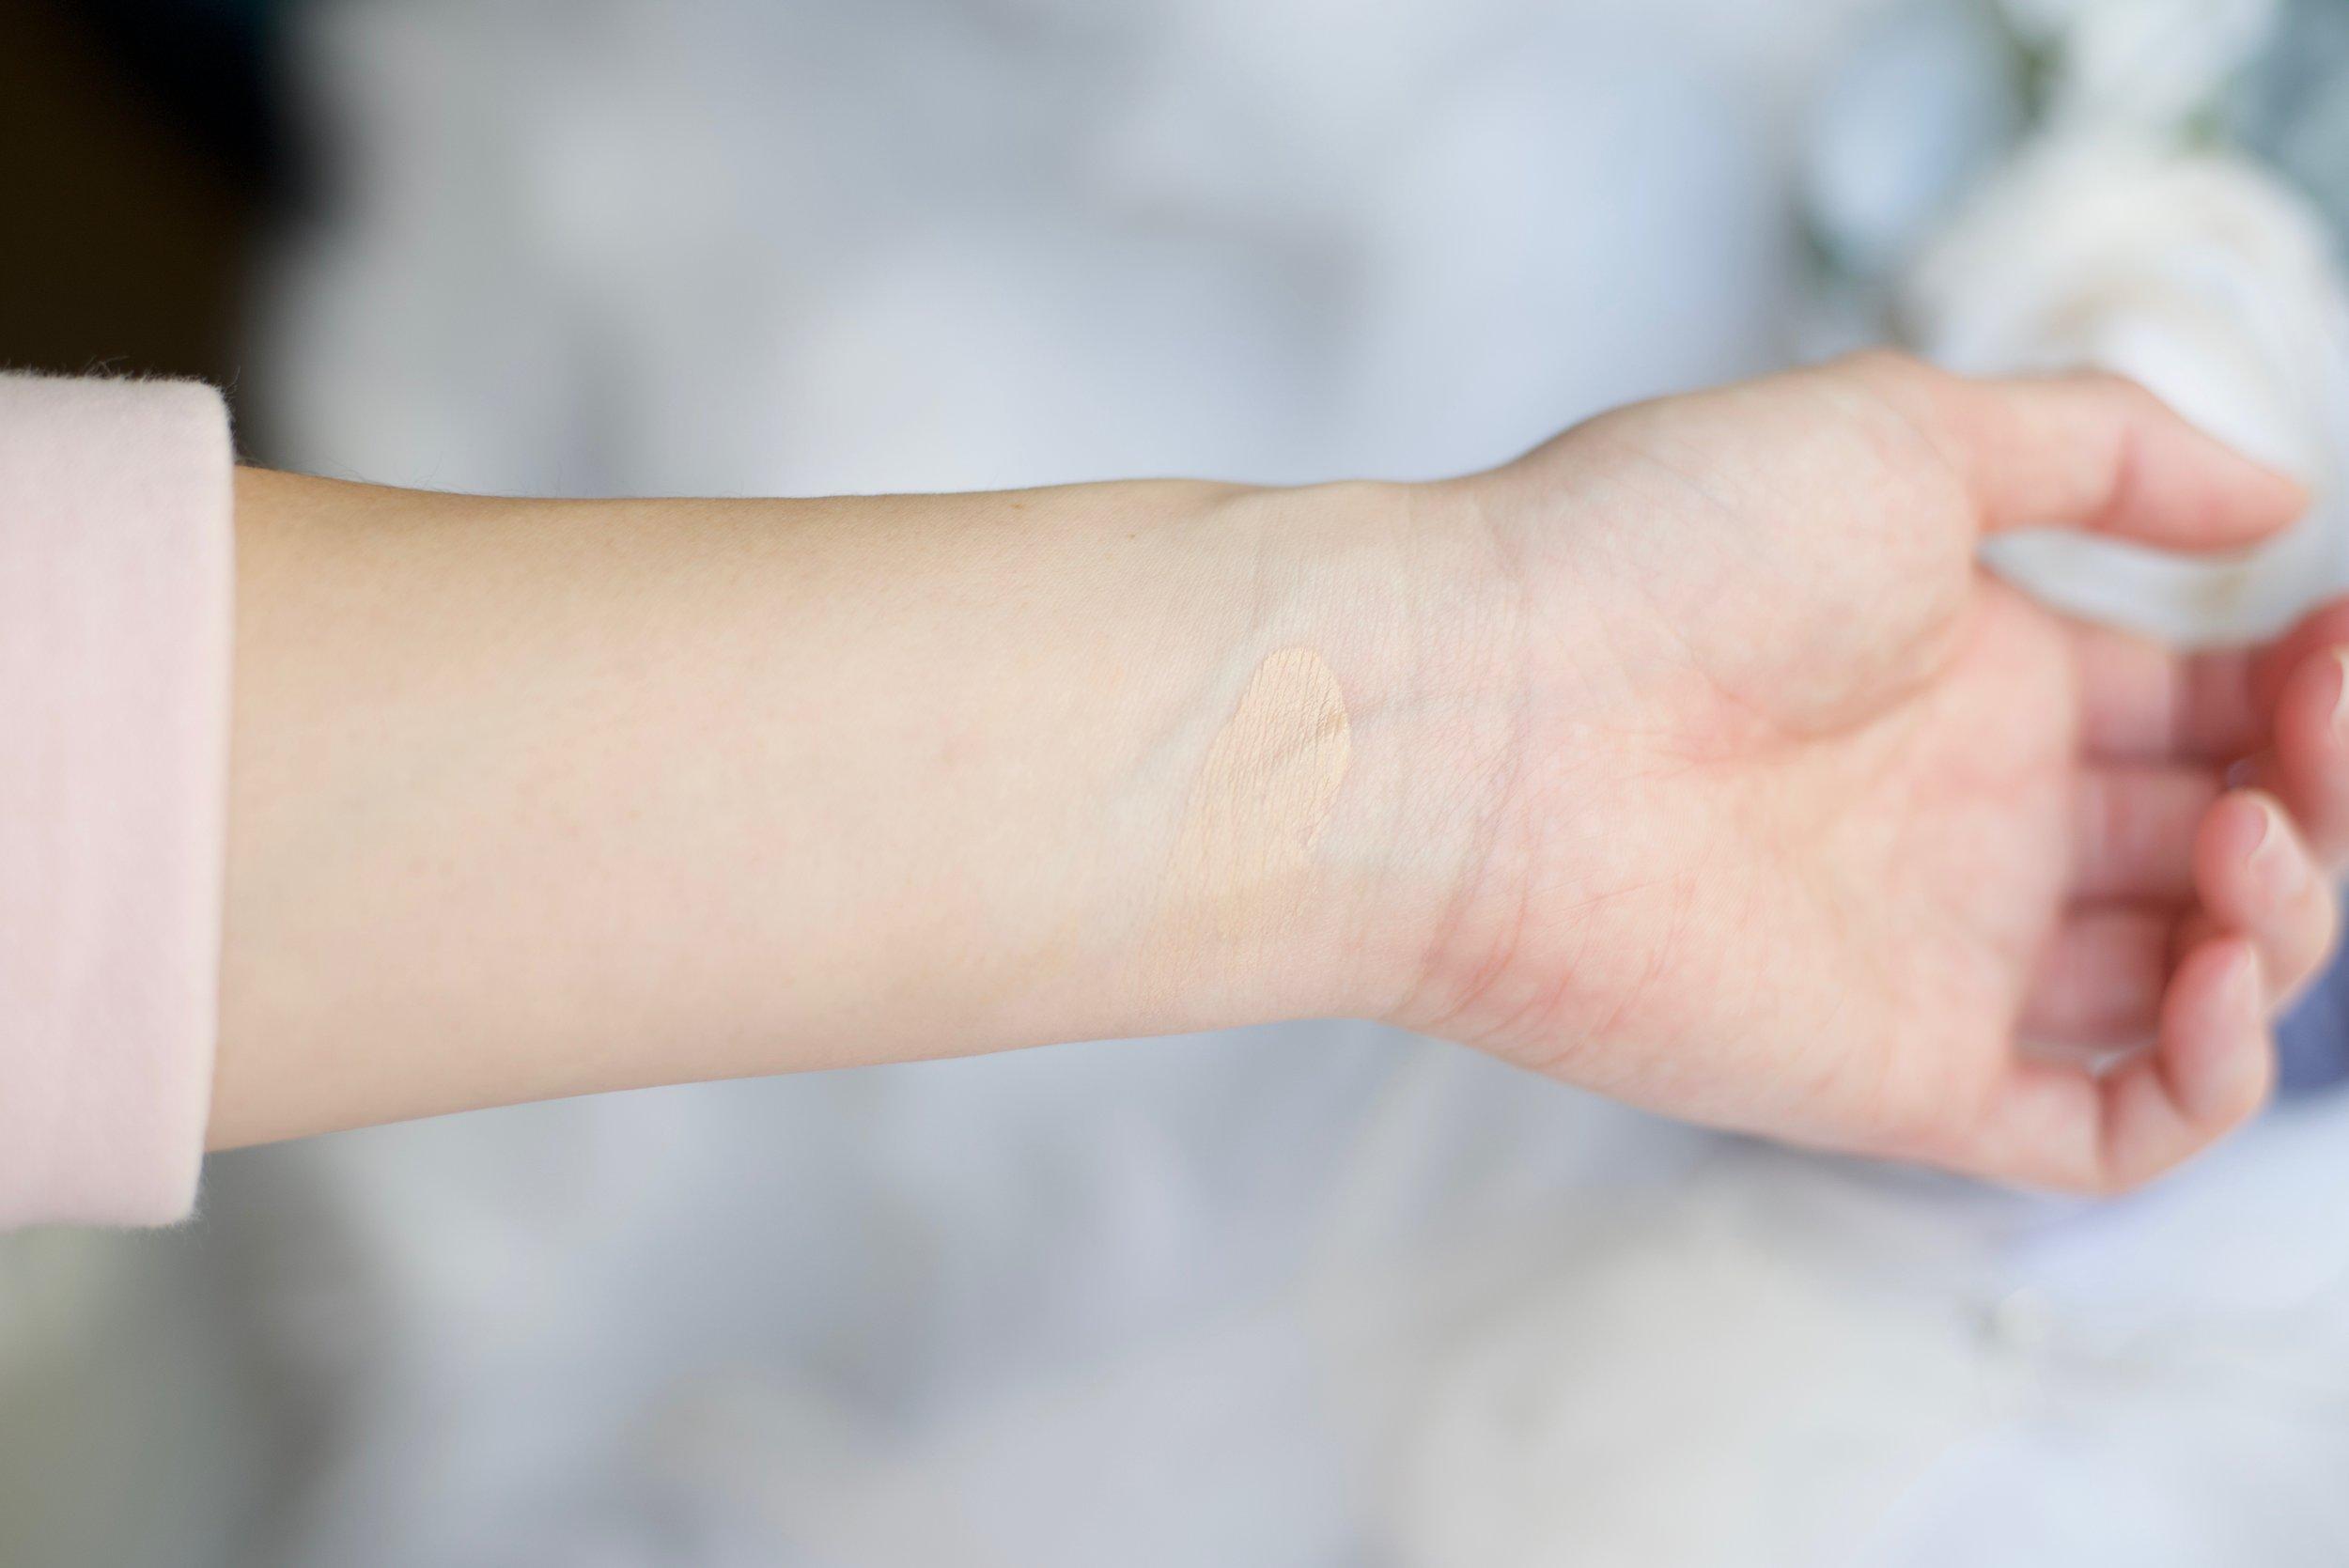 Hera UV Mist Cushion Dry Skin Acne Skin Review_DSC_3637.jpg